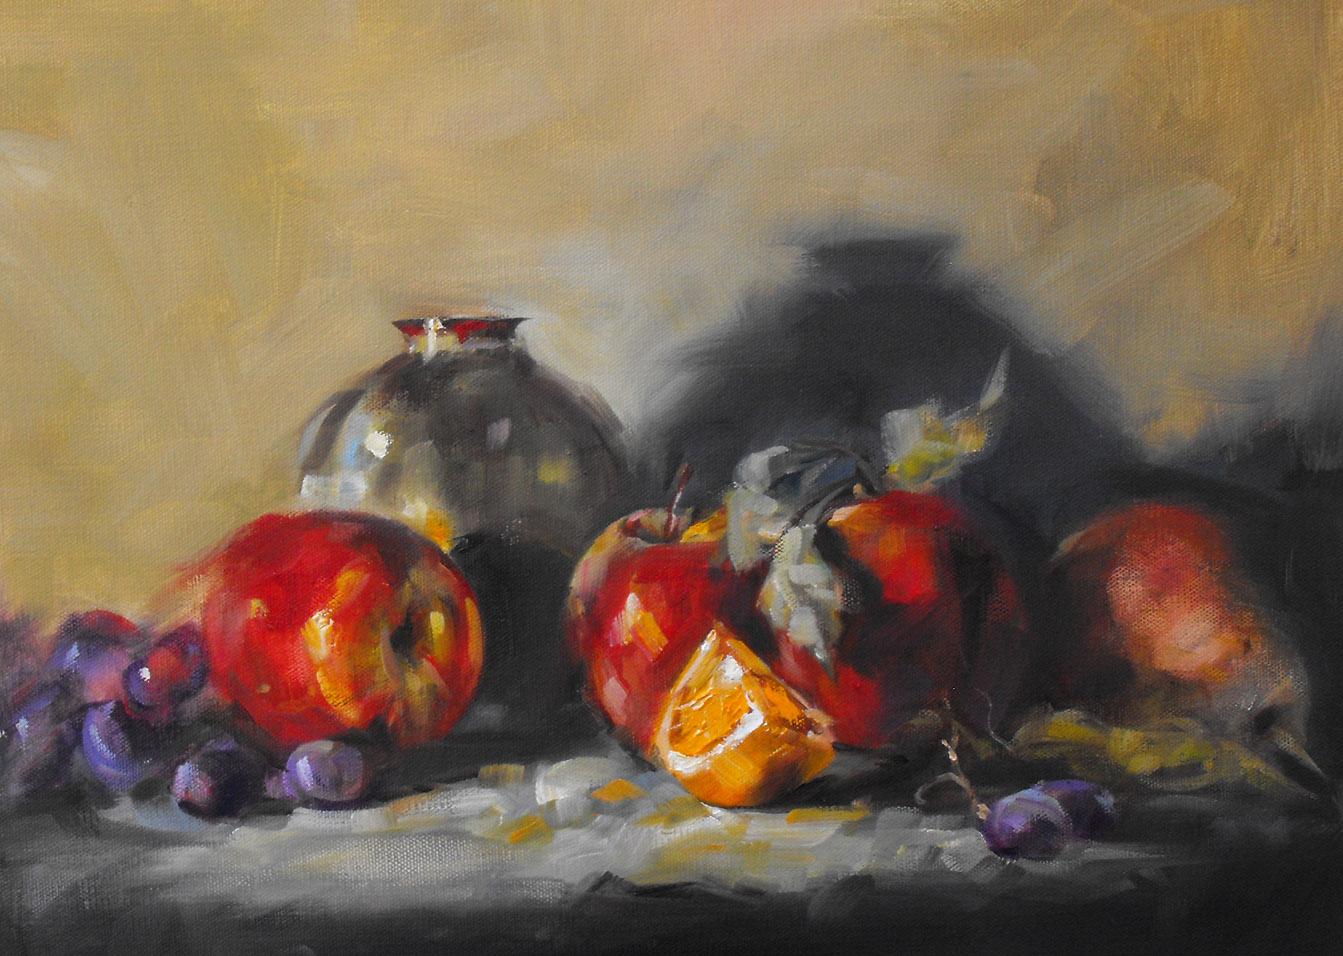 http://1.bp.blogspot.com/-XEkt5hJ7ufs/T6yuleerXlI/AAAAAAAABGc/P4MQnK9lD-Y/s1600/apples+and+small+vase.jpg